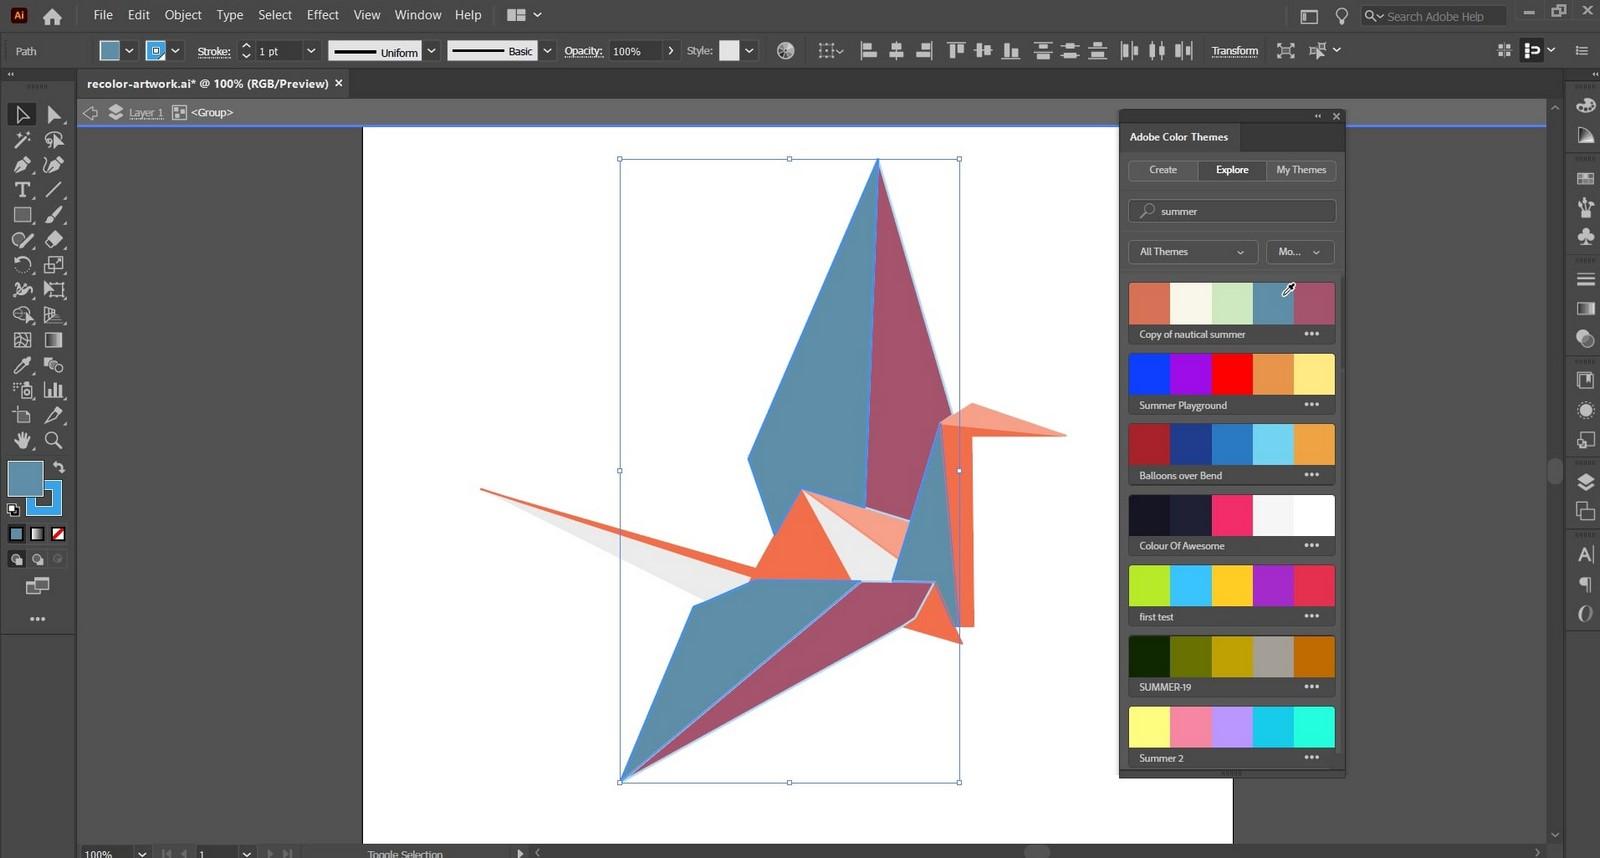 Adobe Color Themes - Sheet2